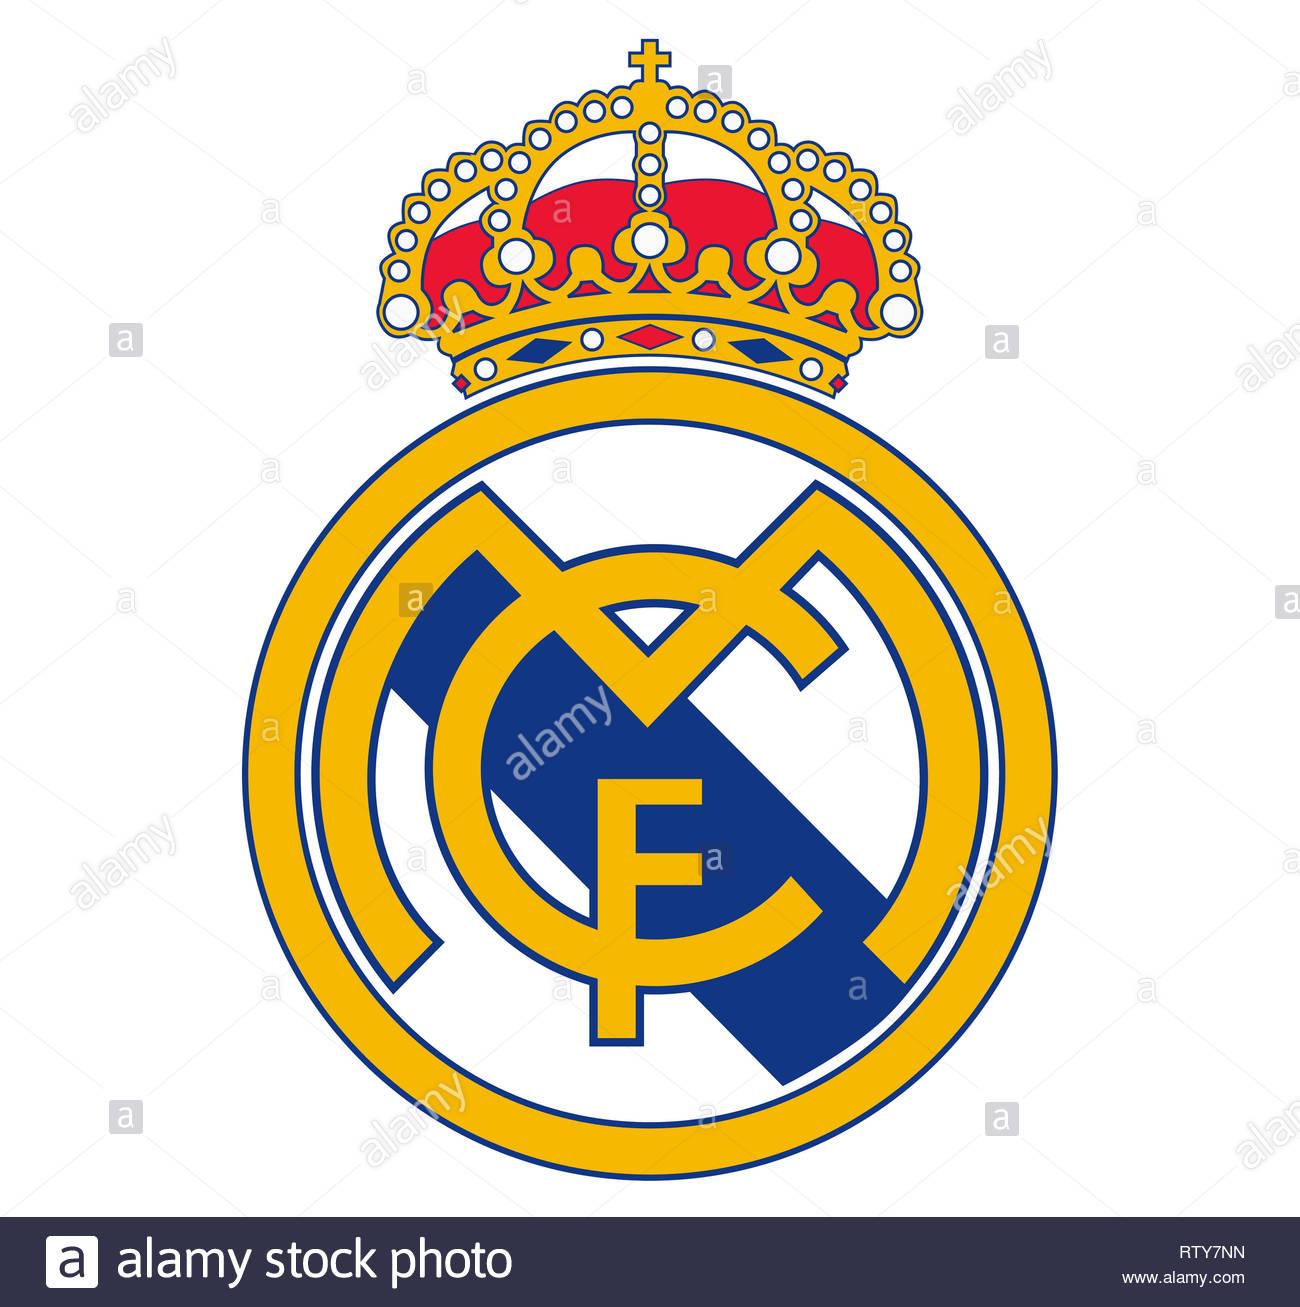 Real Madrid Club logo - Stock Image